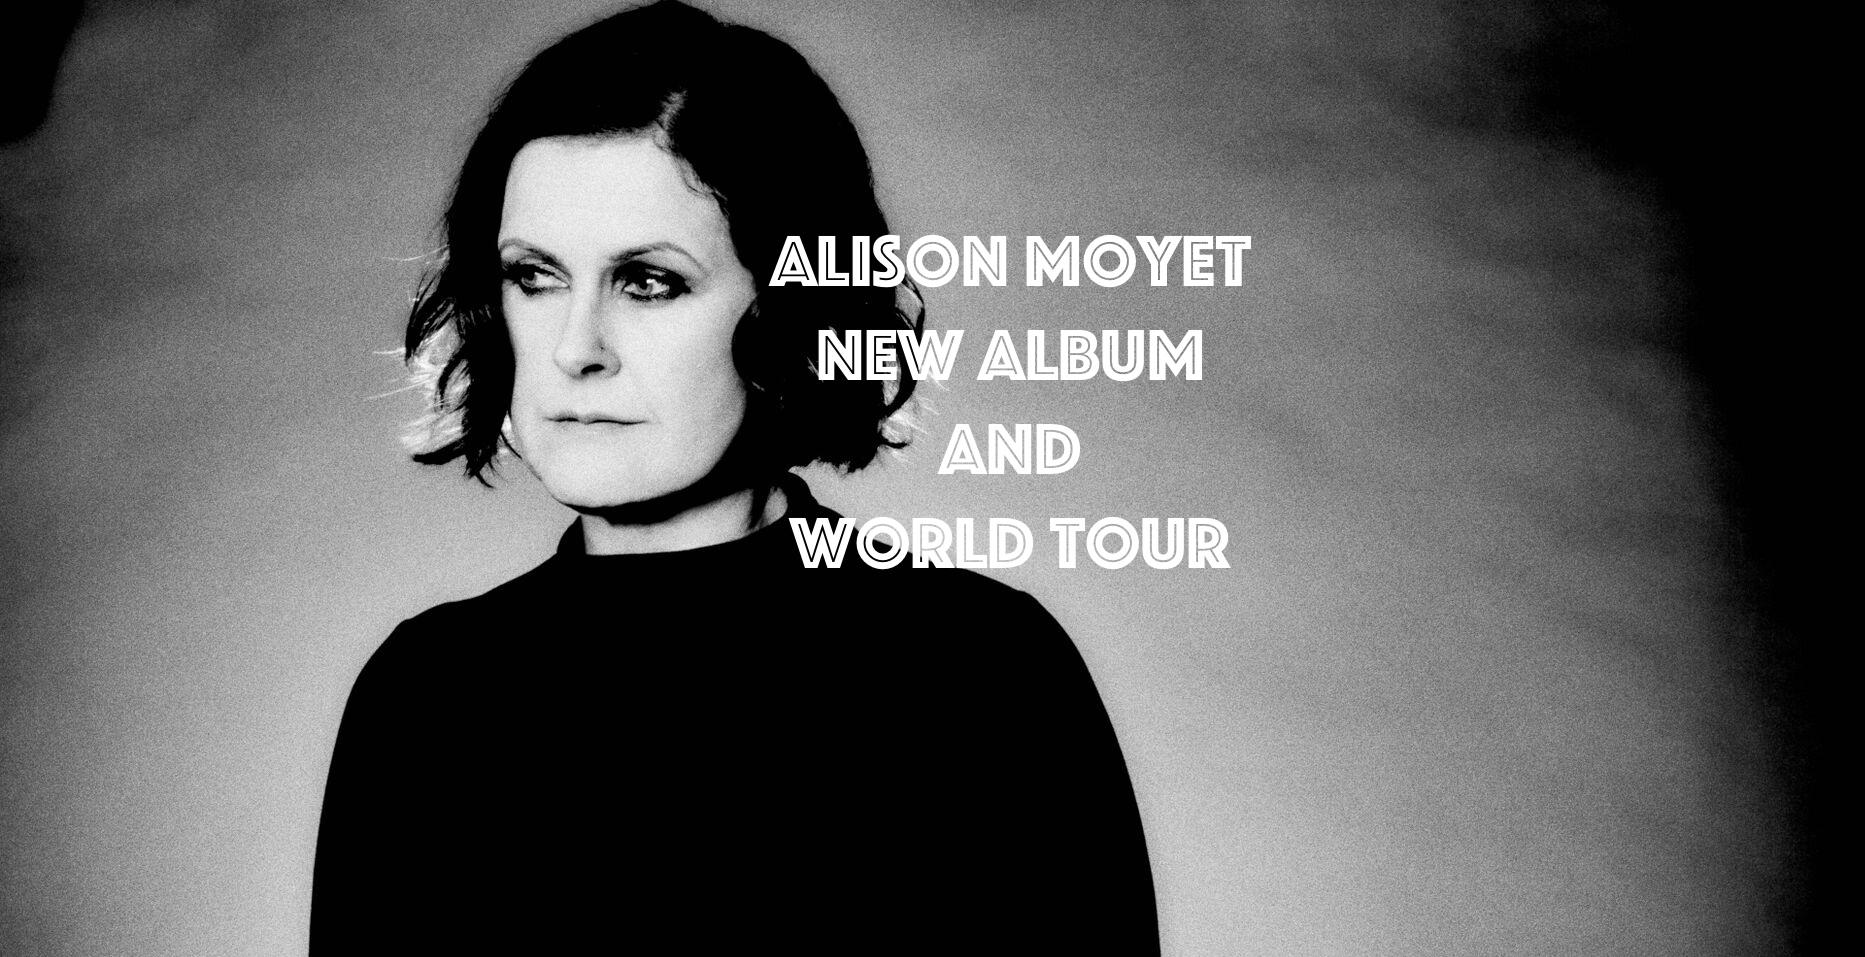 Allison Moyet New Album and World Tour